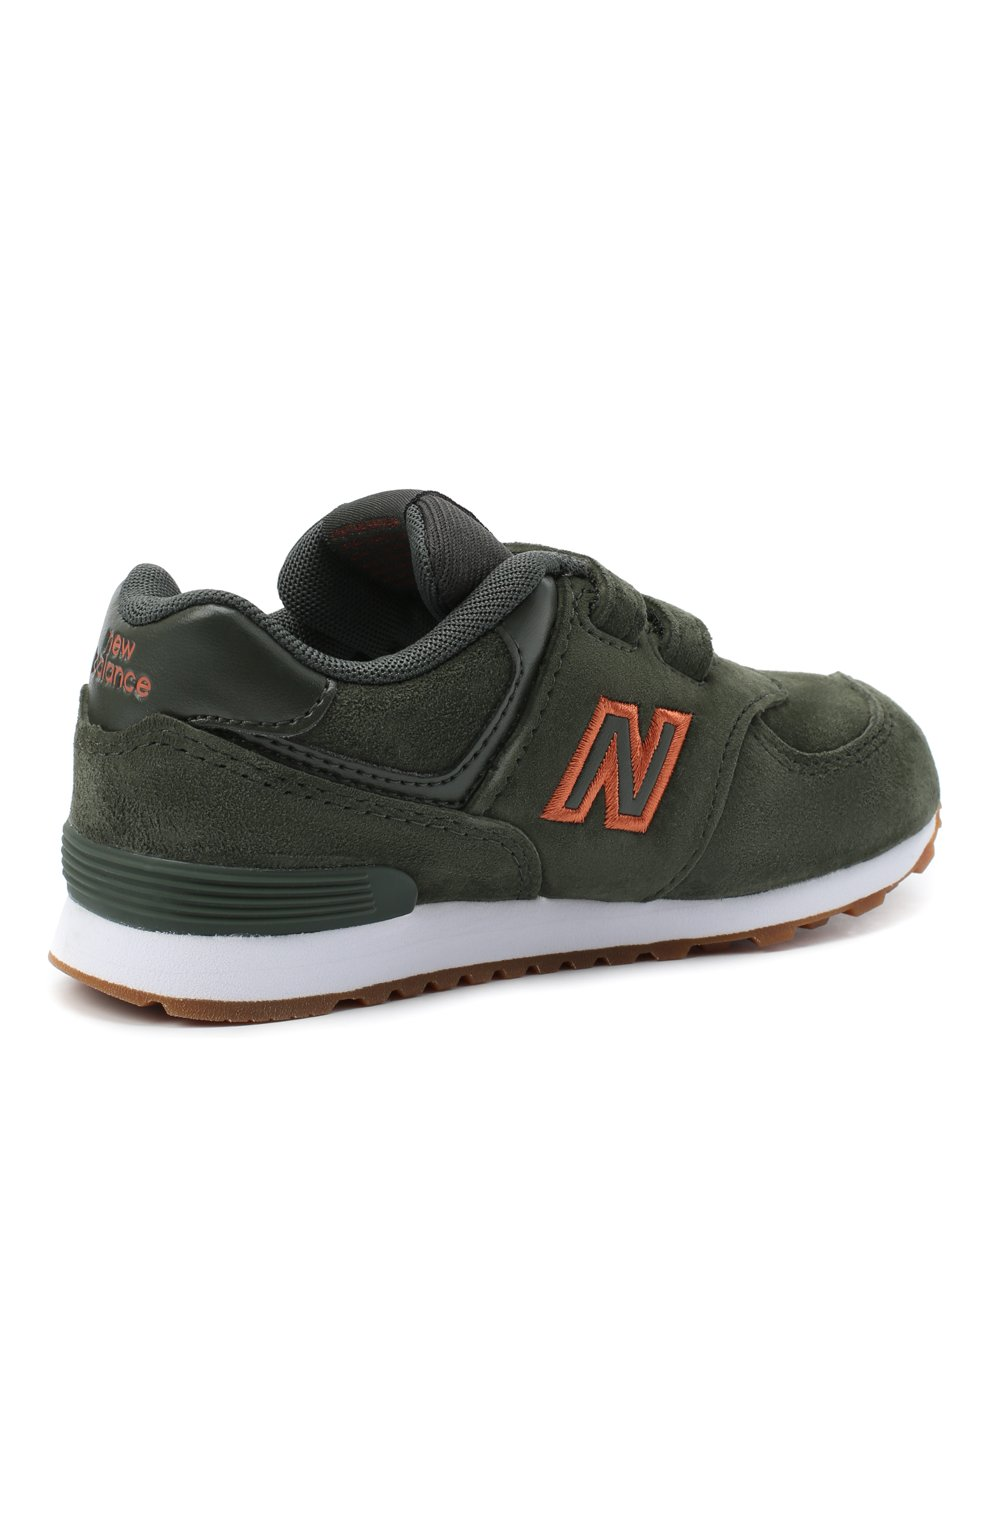 Детские кроссовки 574 NEW BALANCE темно-зеленого цвета, арт. IV574PGO/M | Фото 3 (Стили: Гранж)